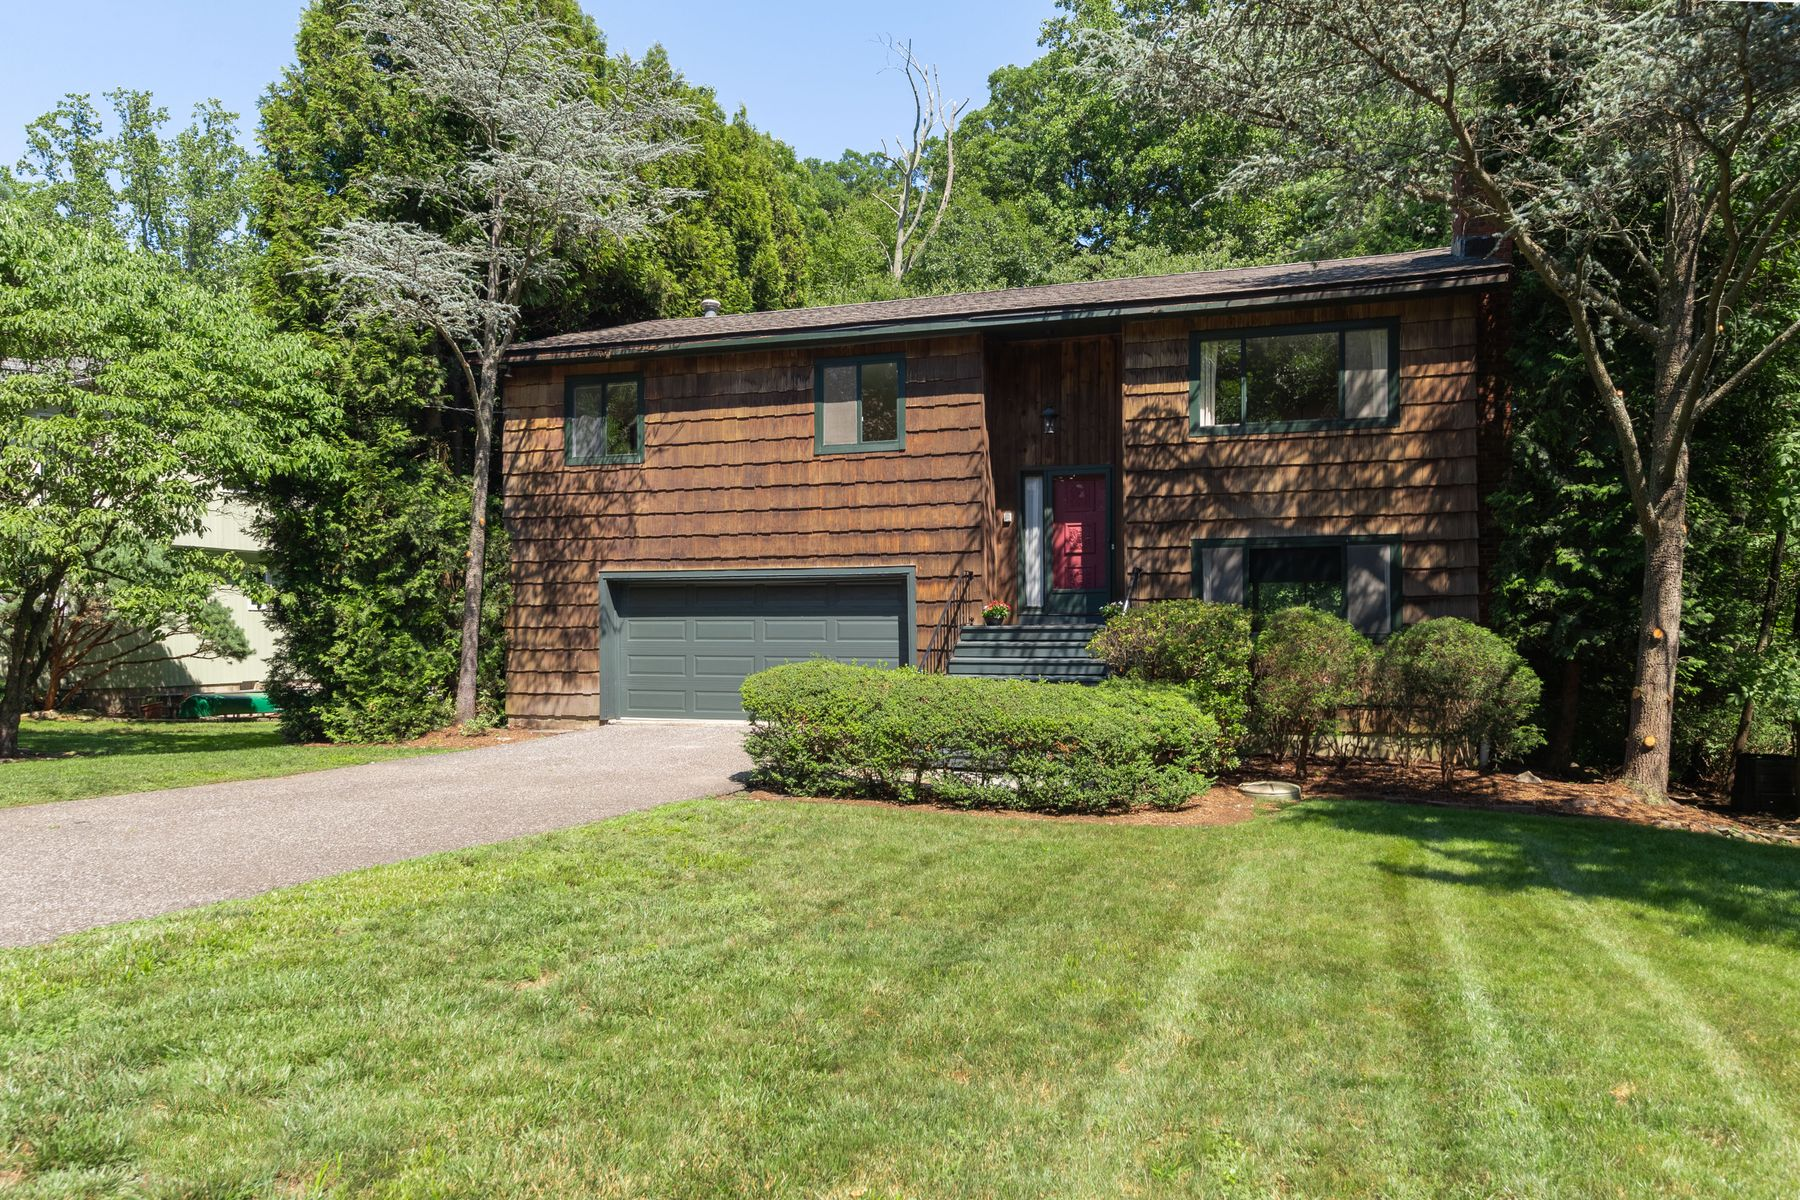 single family homes for Sale at Cos Cob Cul de Sac 43 Sundance Drive, Cos Cob, Connecticut 06807 United States